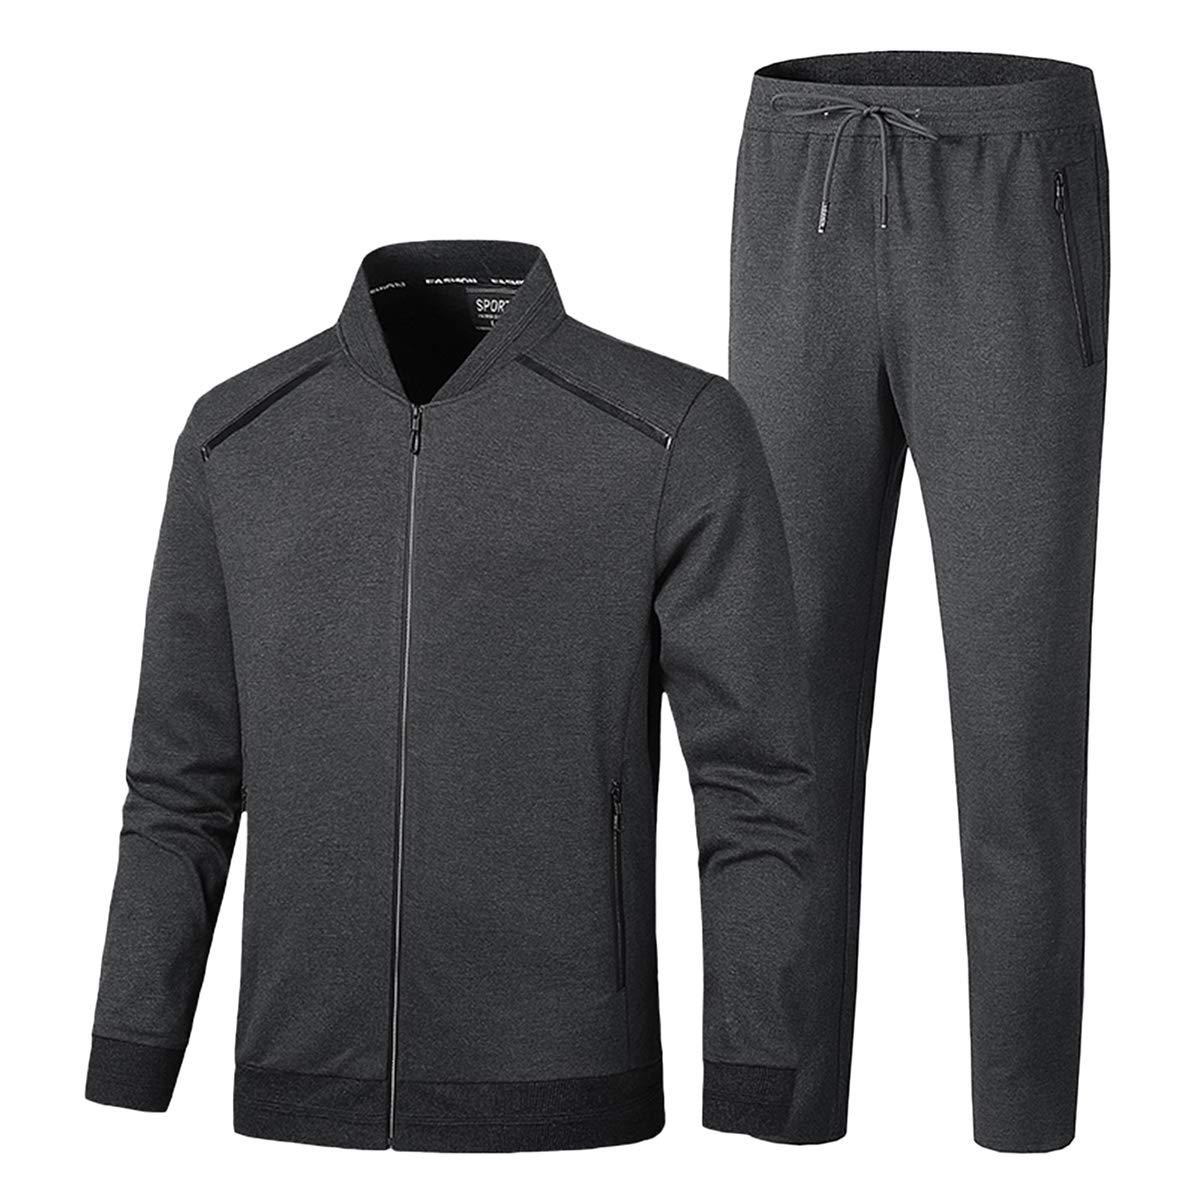 PRIJOUHE Men's Tracksuit Fitness Sport Suits Gym Sports 2 Piece Joggers Sweatpants Sets Gym Jogging Tracksuits by PRIJOUHE